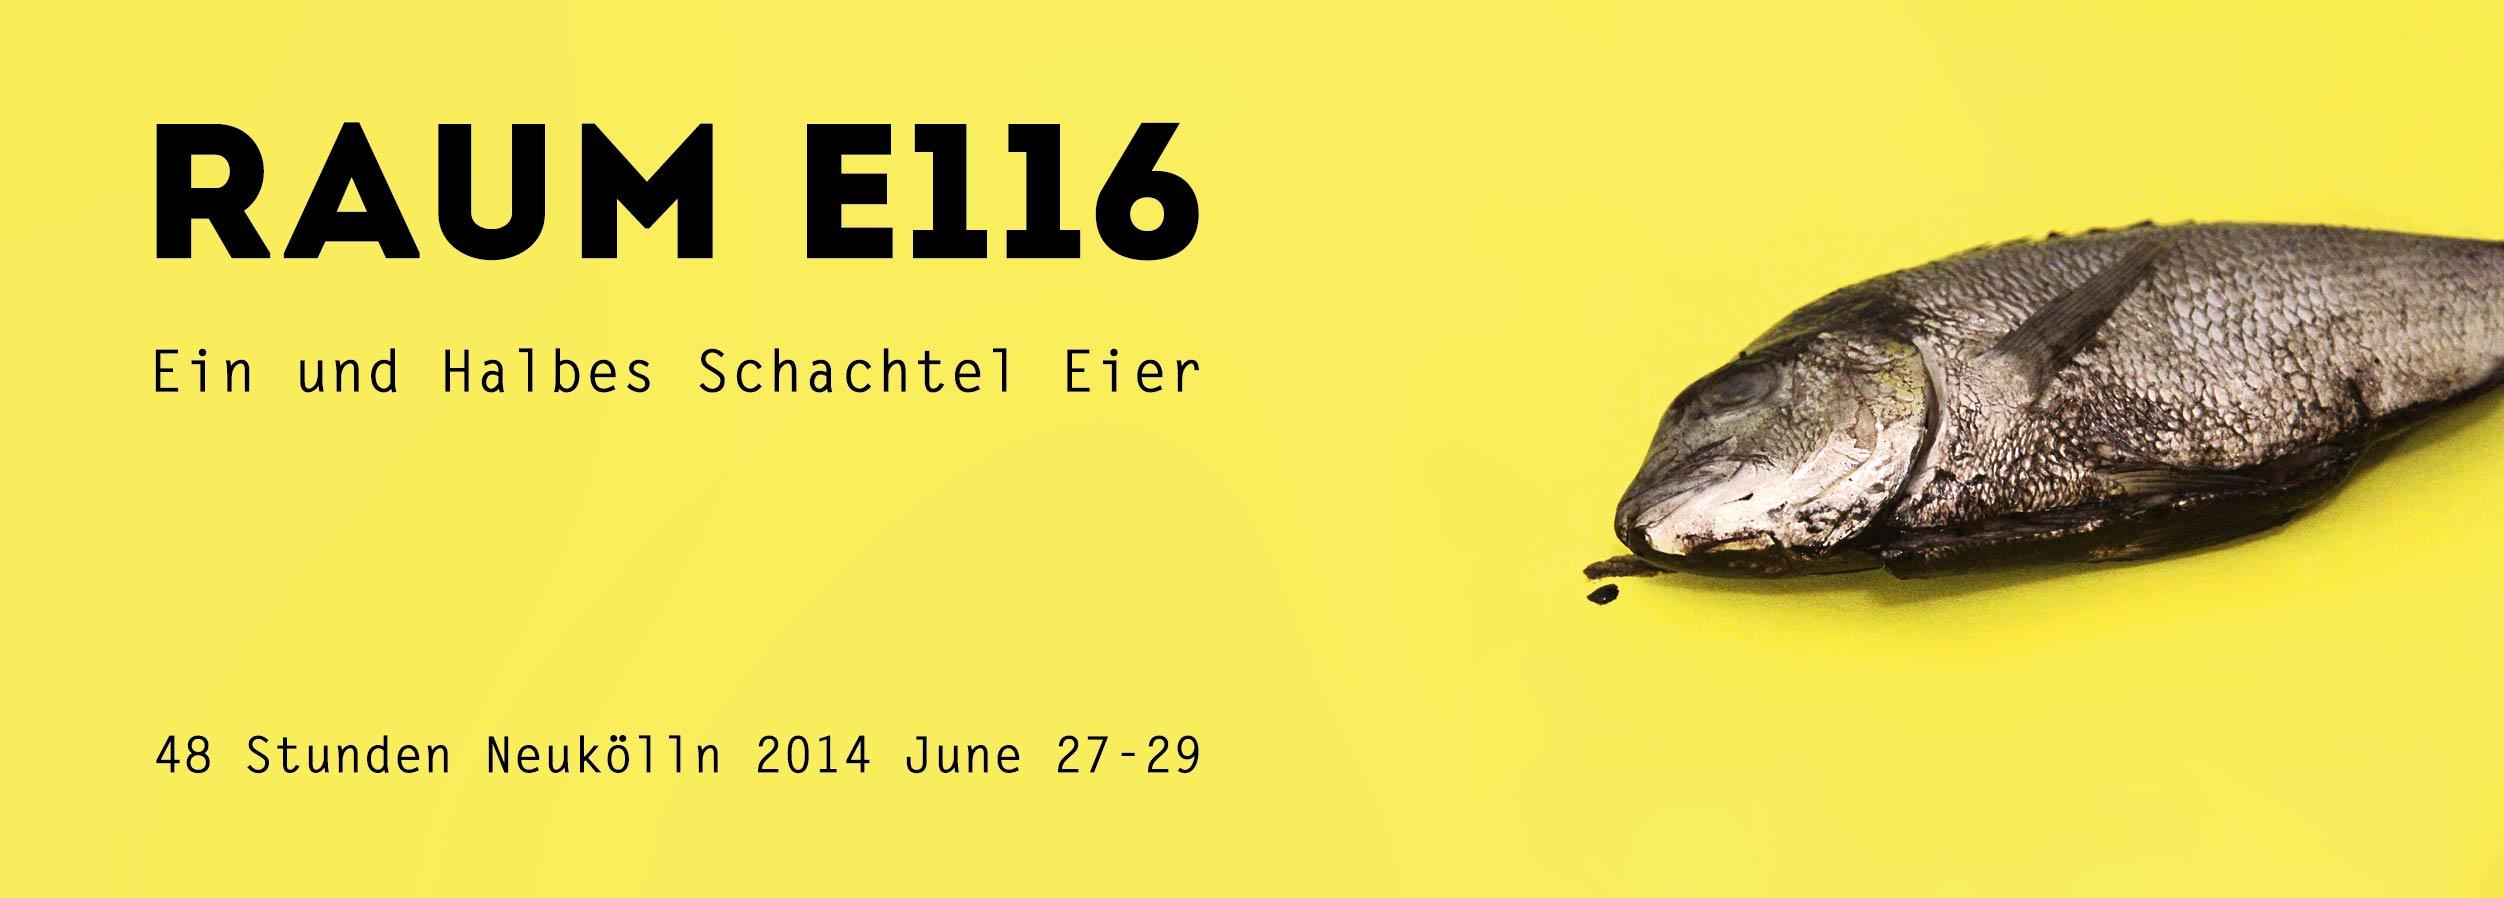 e116-48stunden2014